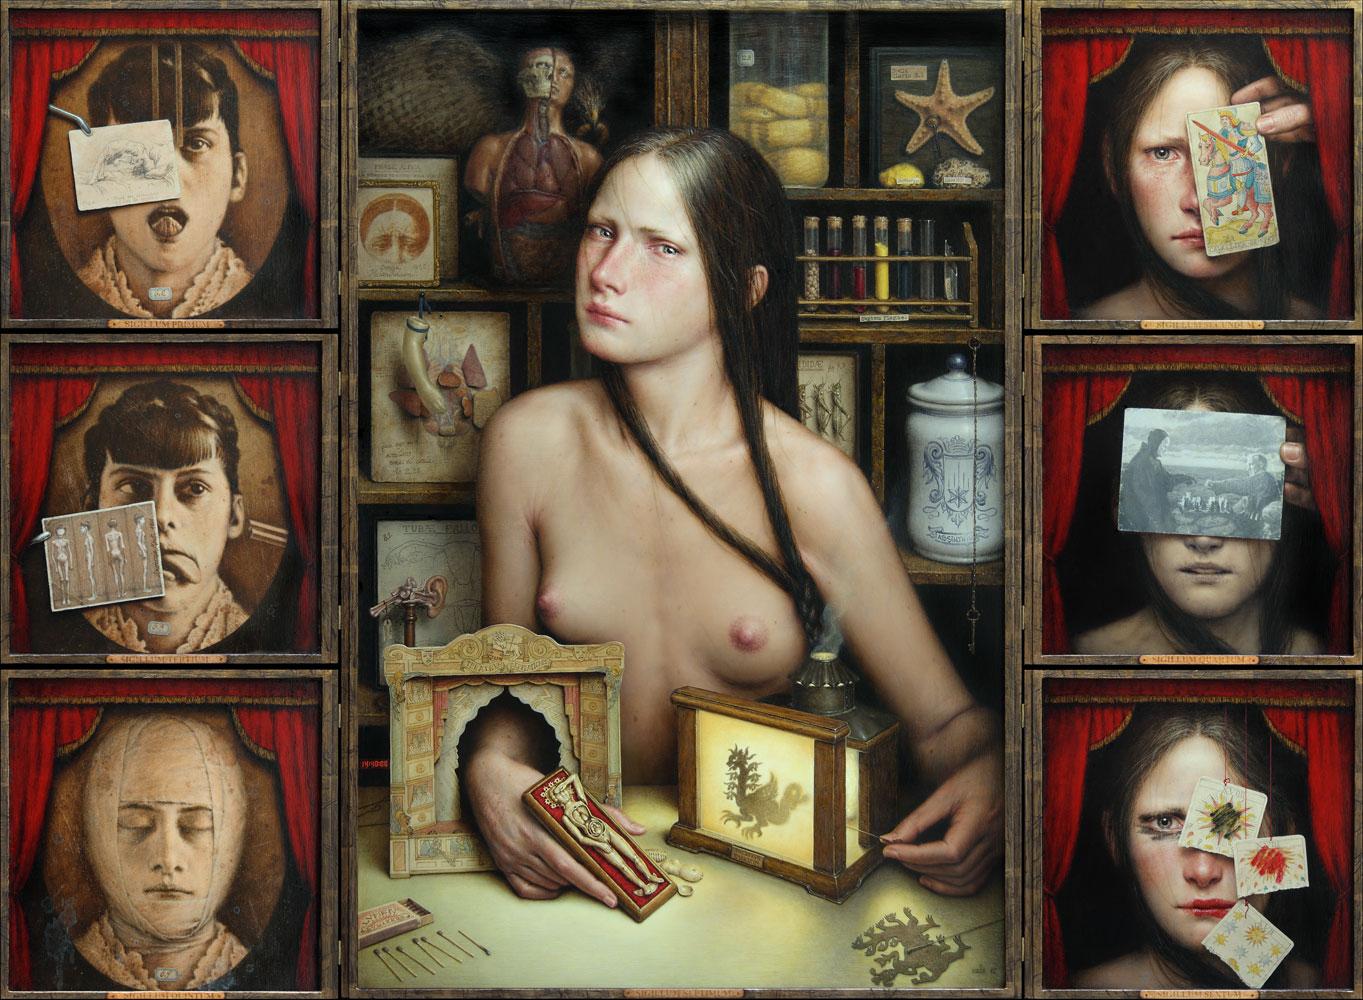 'DIES IRAE' (2012) - Dino Valls